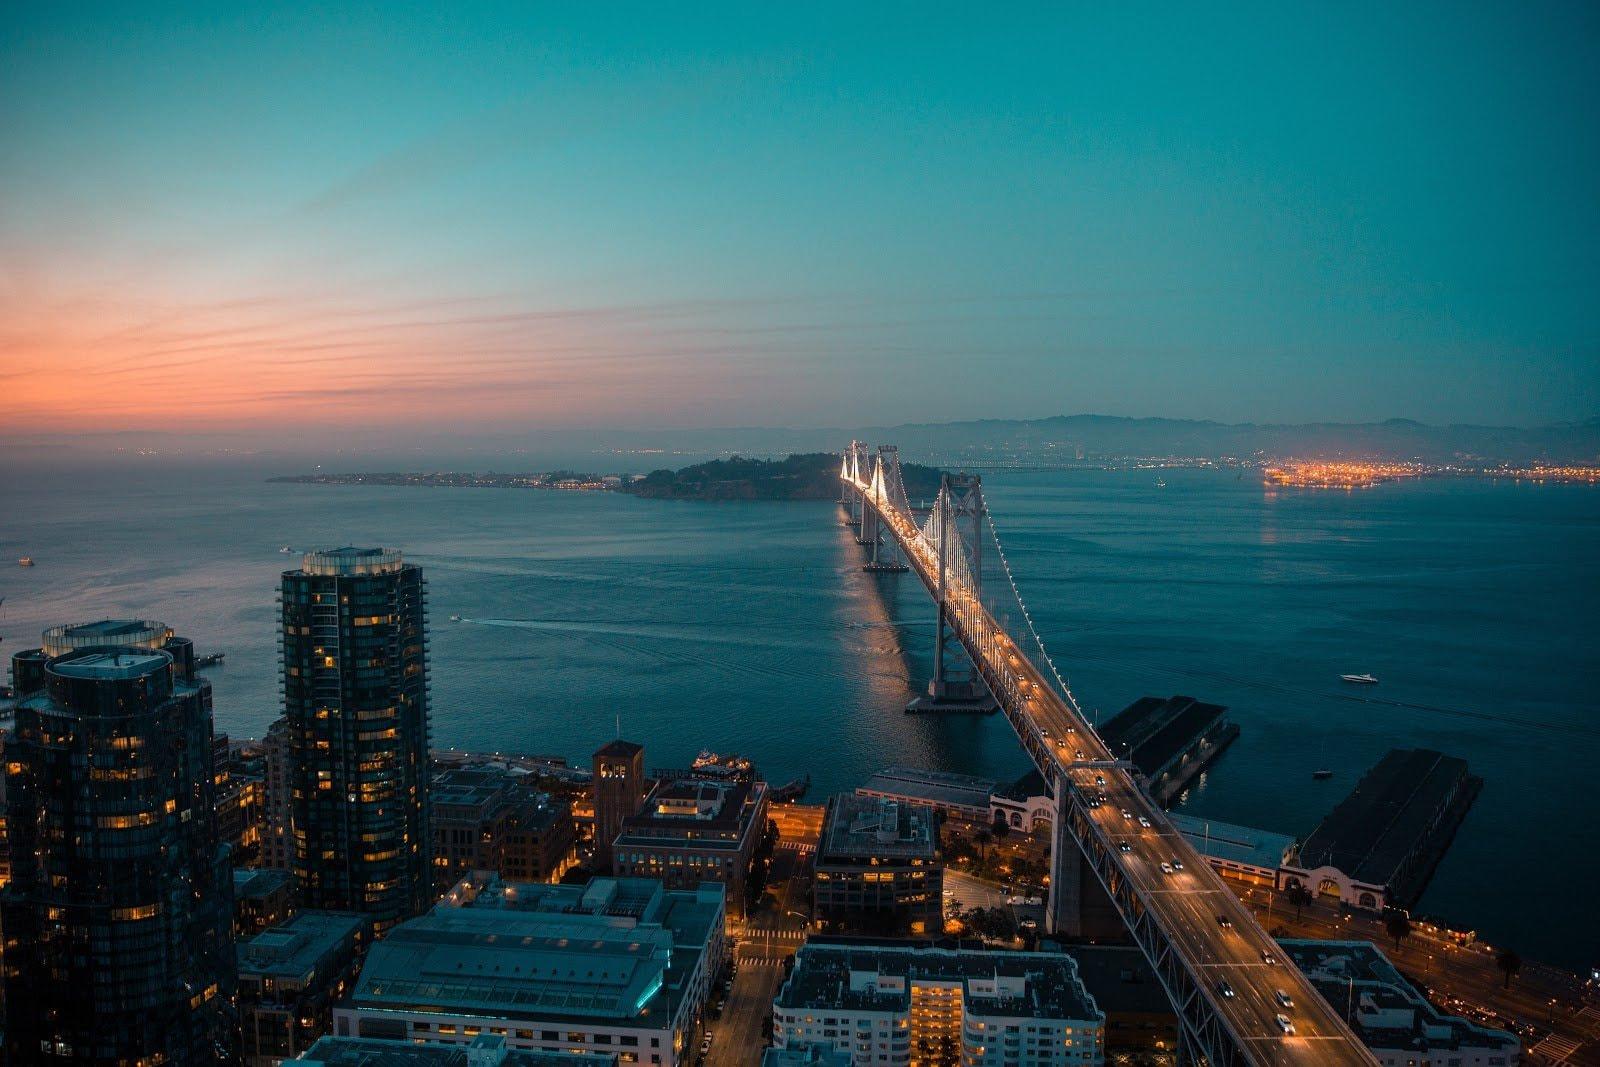 cityscape-photography-josh-bean